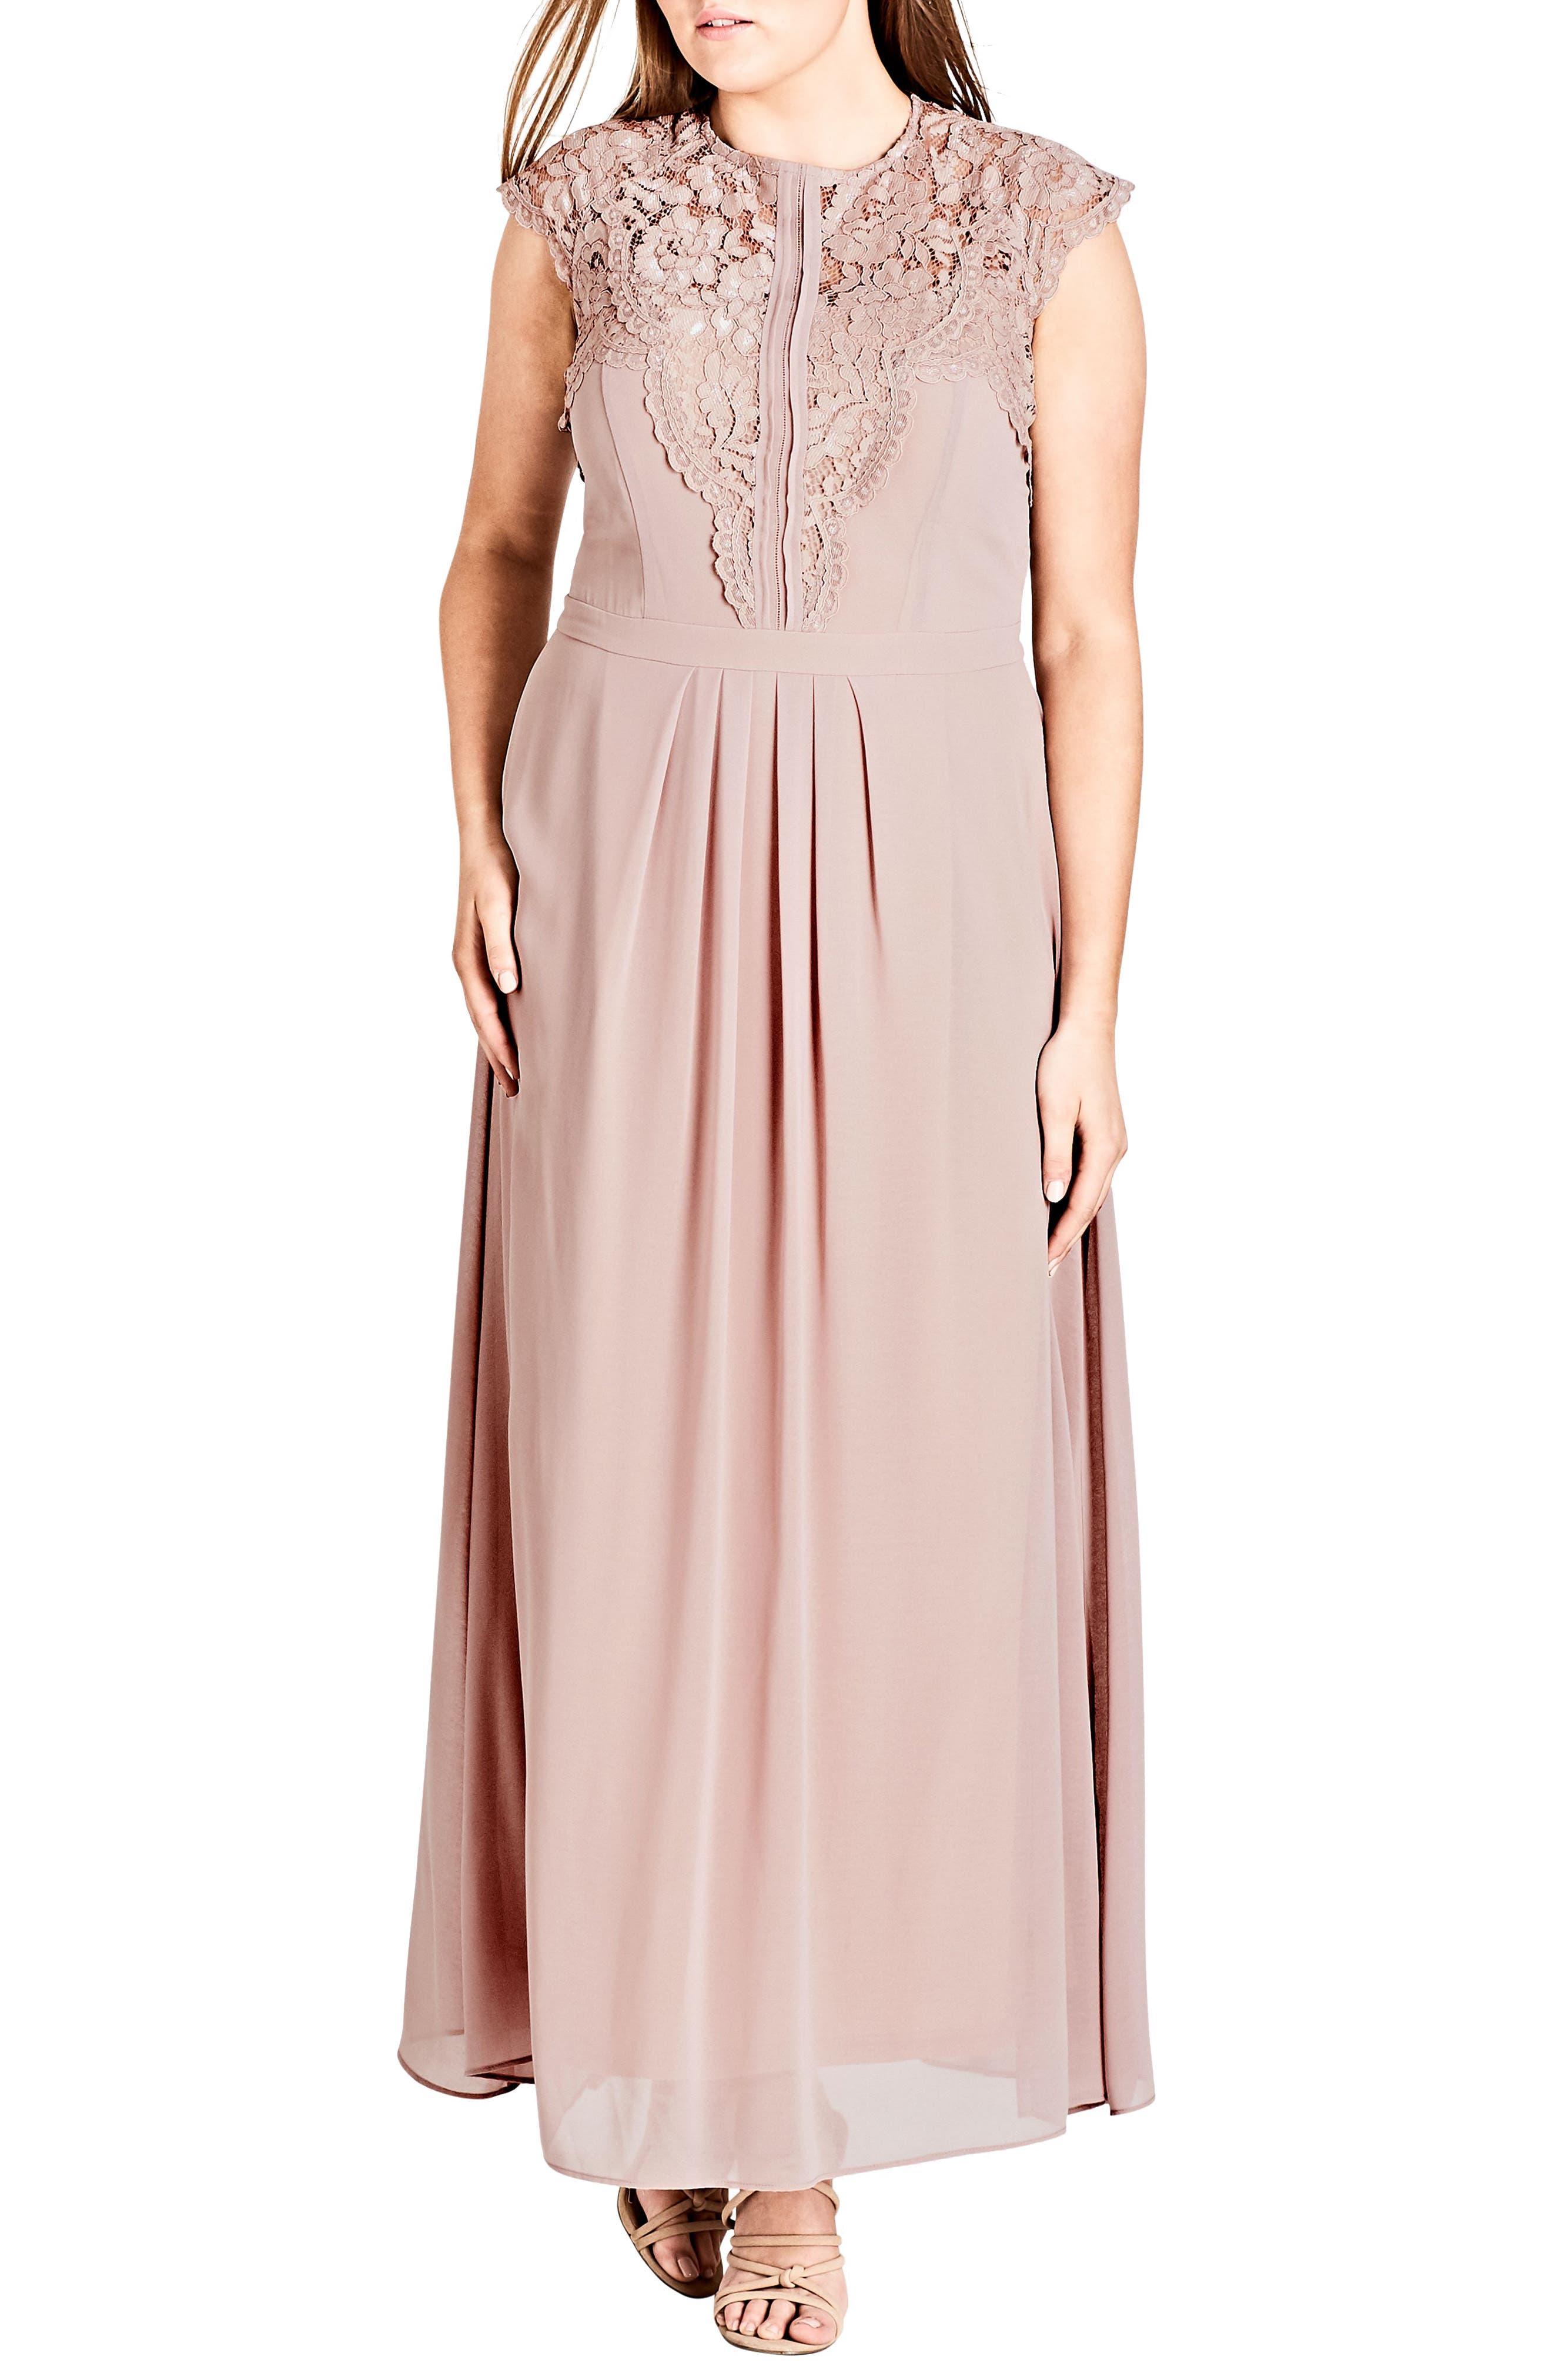 Lace Bodice Maxi Dress,                             Main thumbnail 1, color,                             MUSHROOM